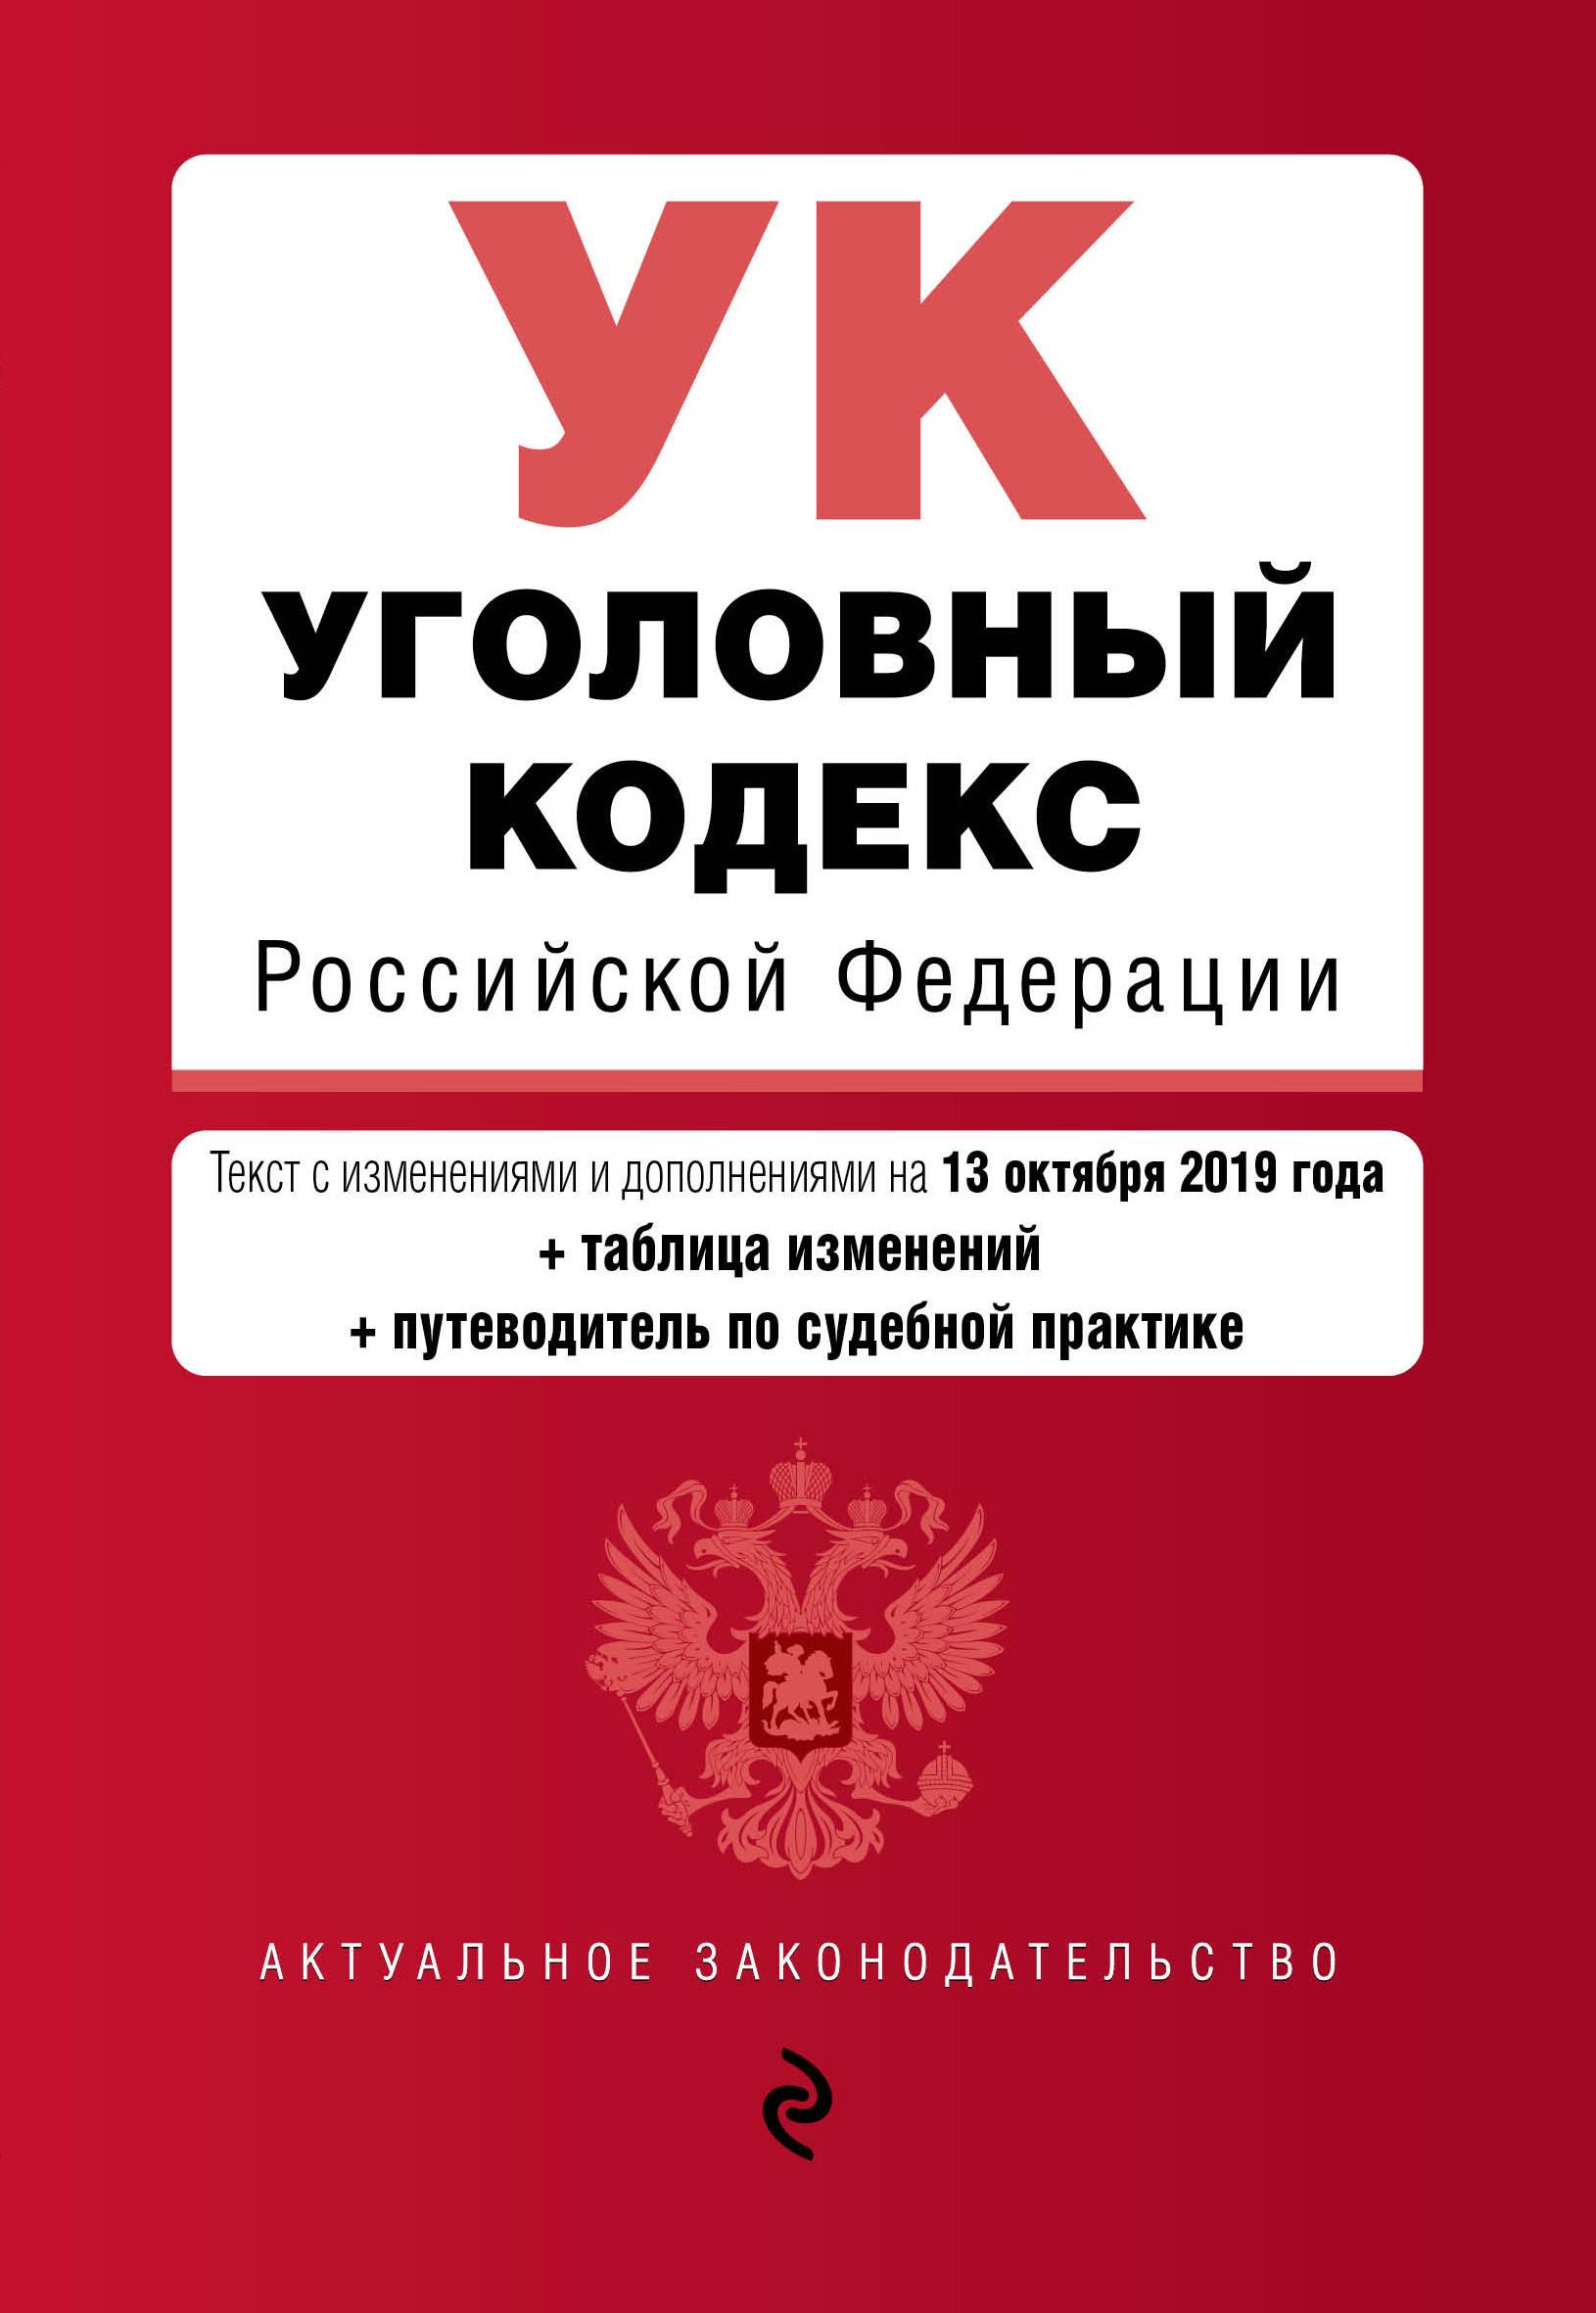 Ugolovnyj kodeks Rossijskoj Federatsii. Tekst s izm. i dop. na 13 oktjabrja 2019 goda (+ tablitsa izmenenij) (+ putevoditel po sudebnoj praktike)